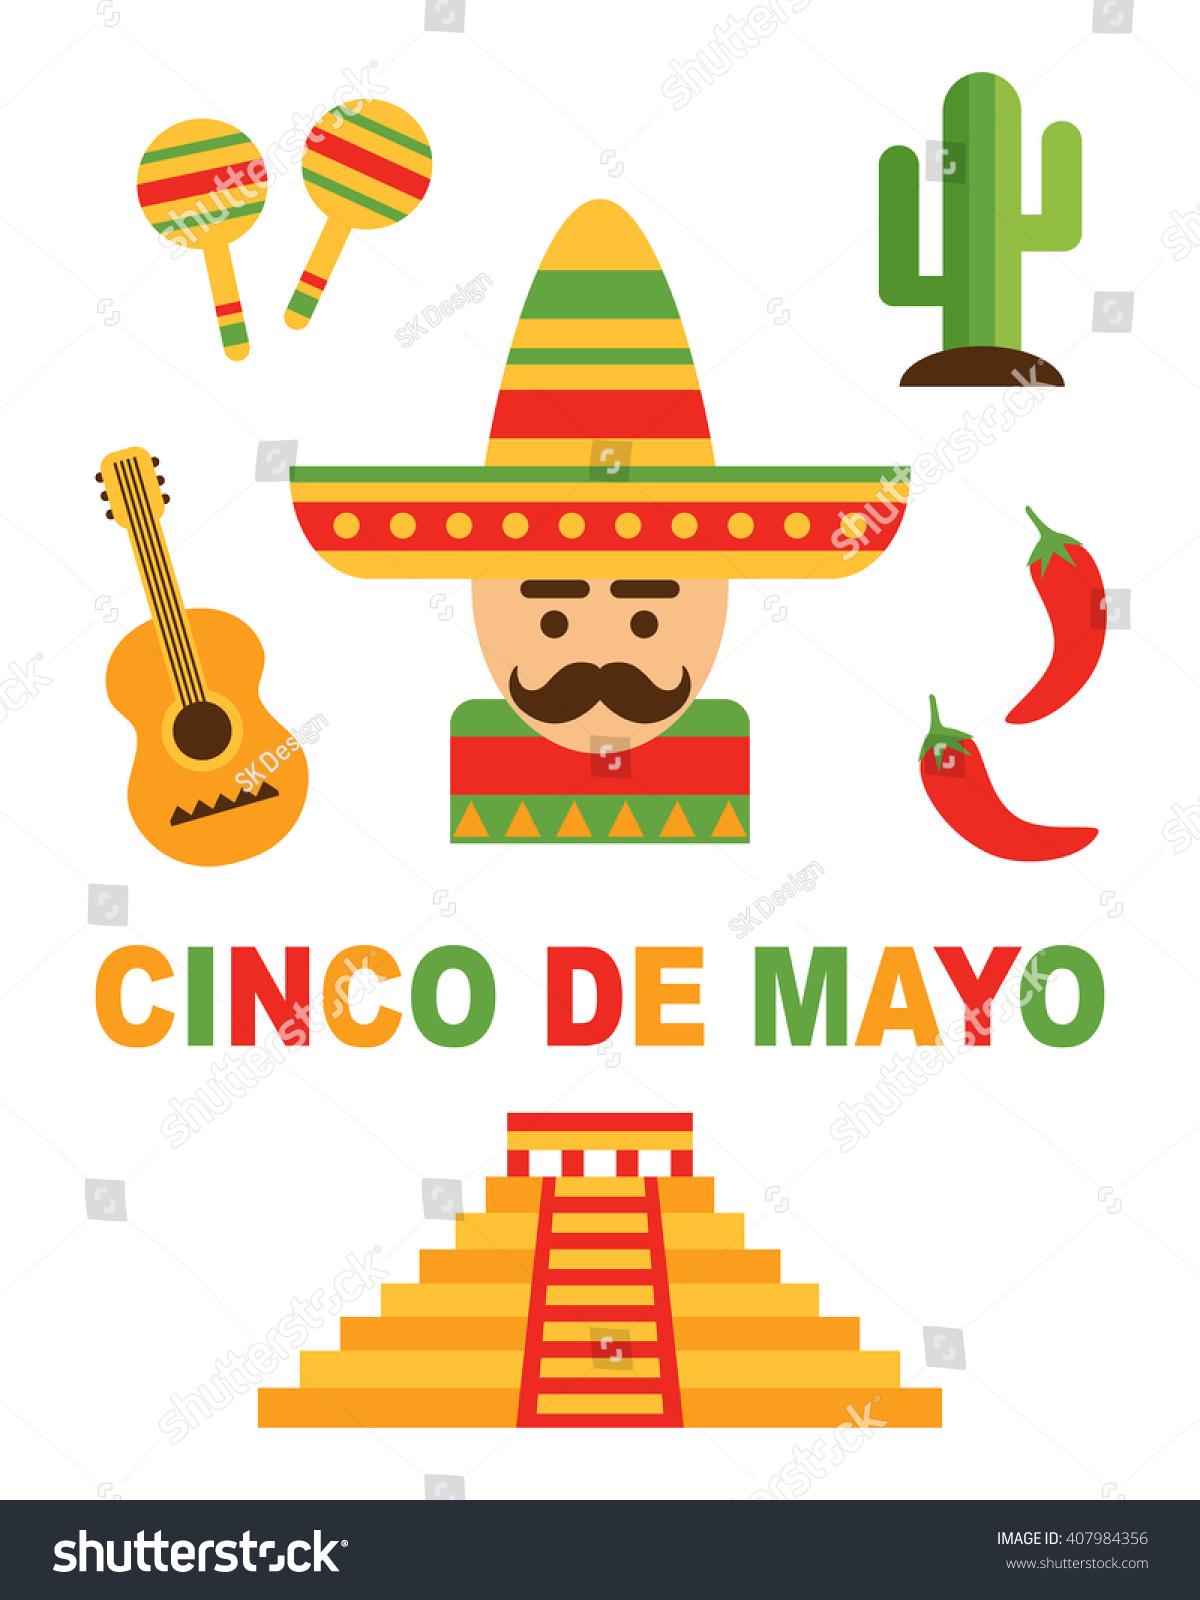 cinco de mayo festival mexican design stock vector 407984356 shutterstock. Black Bedroom Furniture Sets. Home Design Ideas